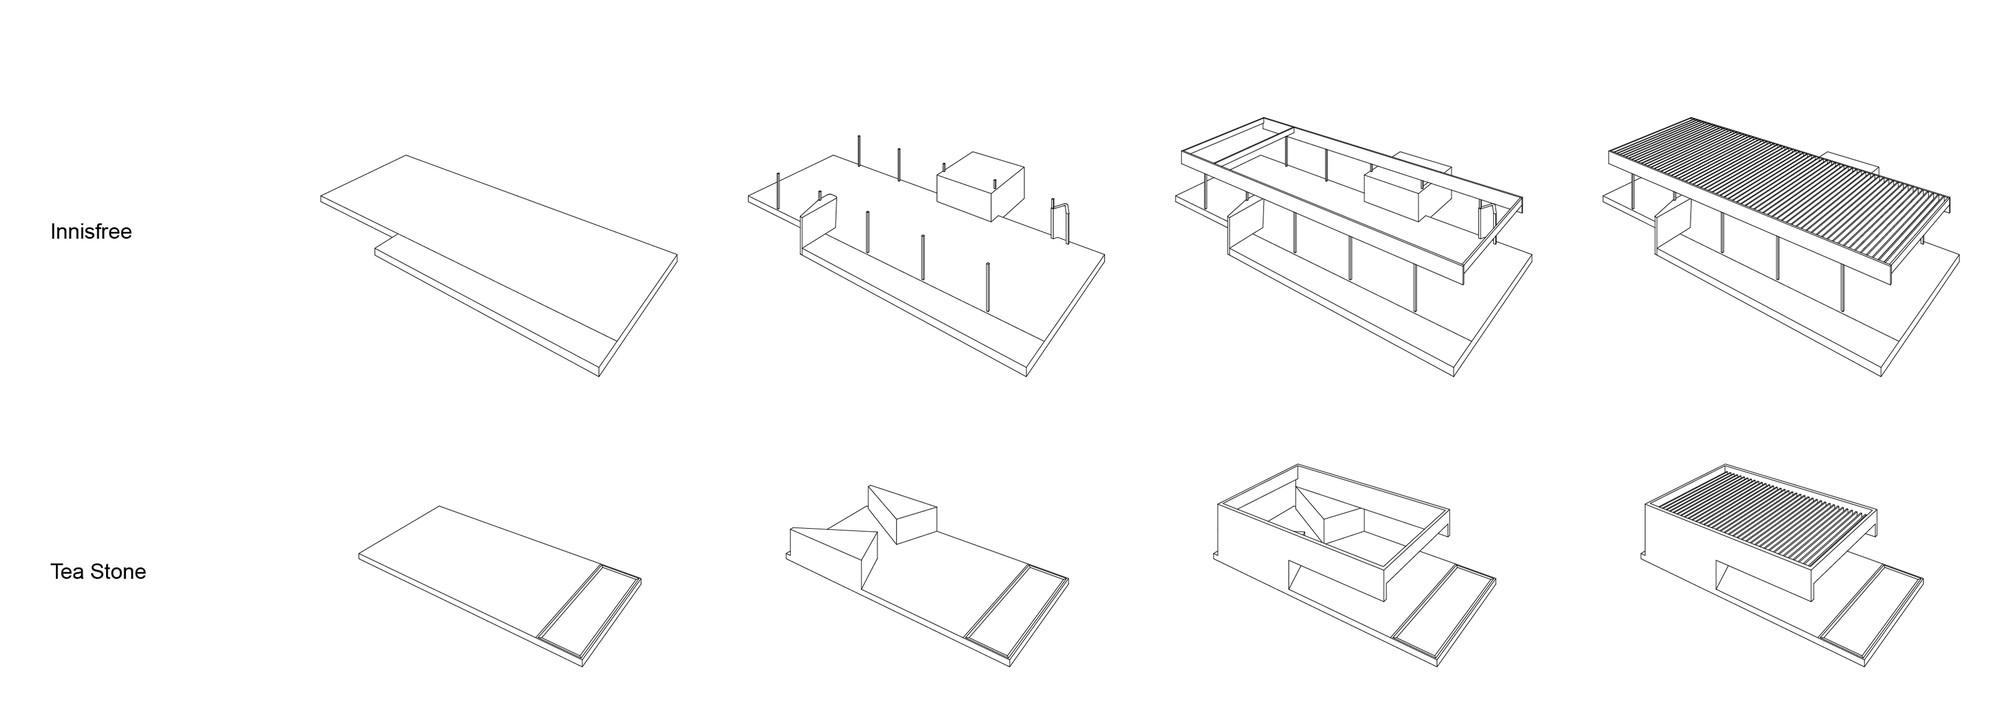 57c01233e58ececcfd000105 Splow House Delution Architect Diagram further 54b8a25ee58ecea3b400013b Diagram further 51388211b3fc4b760b000087 Luchtsingel Zus Hofbogen Bv Image furthermore The 20cut 20empty also 522bcd9de8e44e12f6000088 Via 31 Somdoon Architects Ltd Diagram. on diagram view